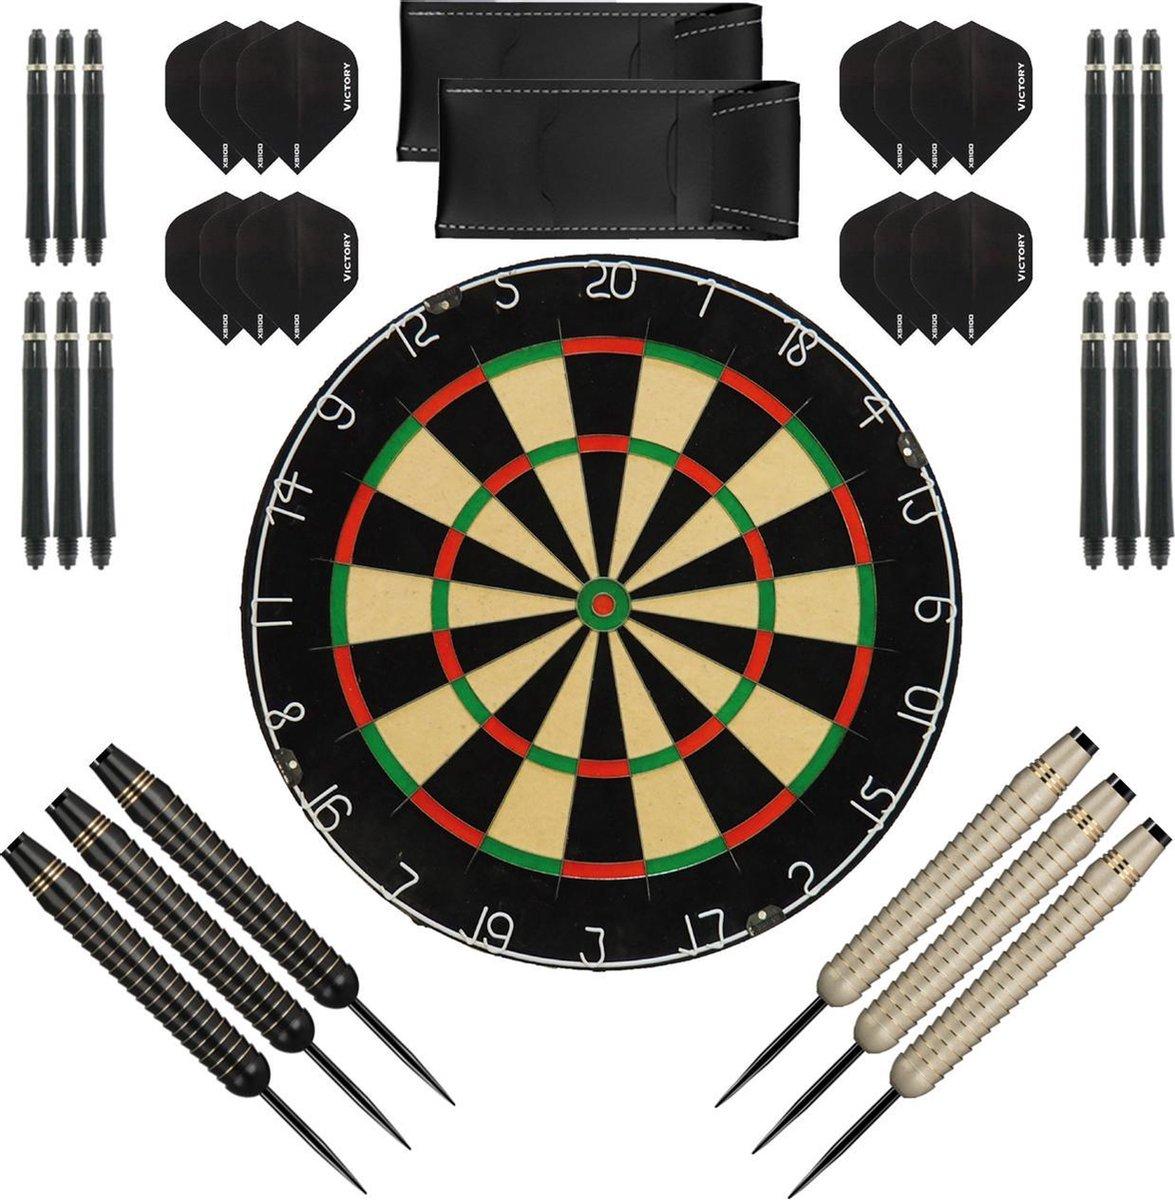 Dragon Darts complete Shark dartset - XQ-Max plain - dartbord - dart shafts - dart flights - dartpijlen 24 gram - 100% brass - 2 sets - dartpijlen - zwart-wit